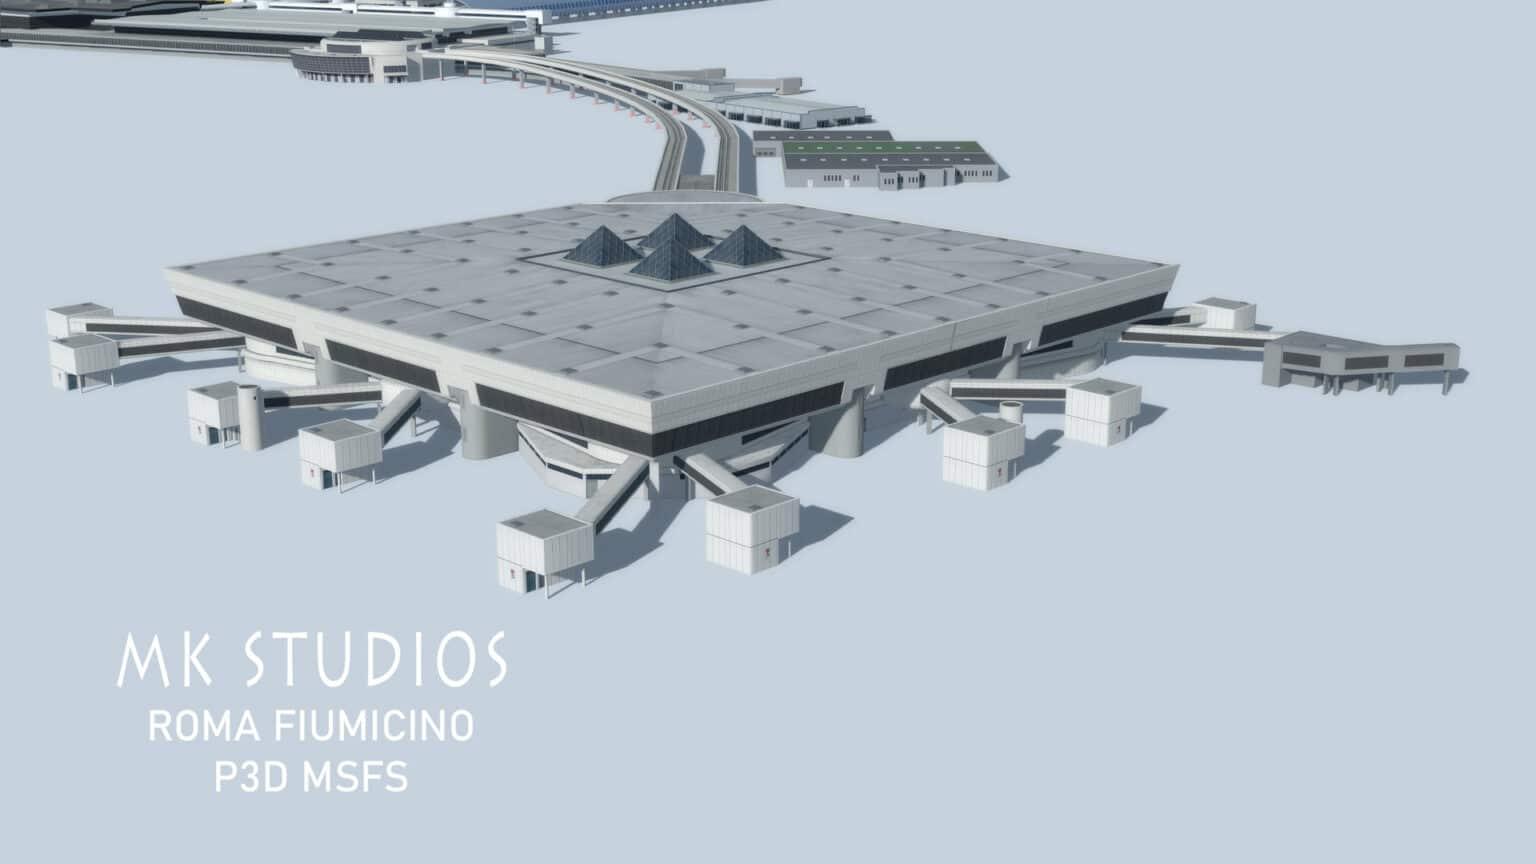 MK-Stduios_Update_Roadmap (7)